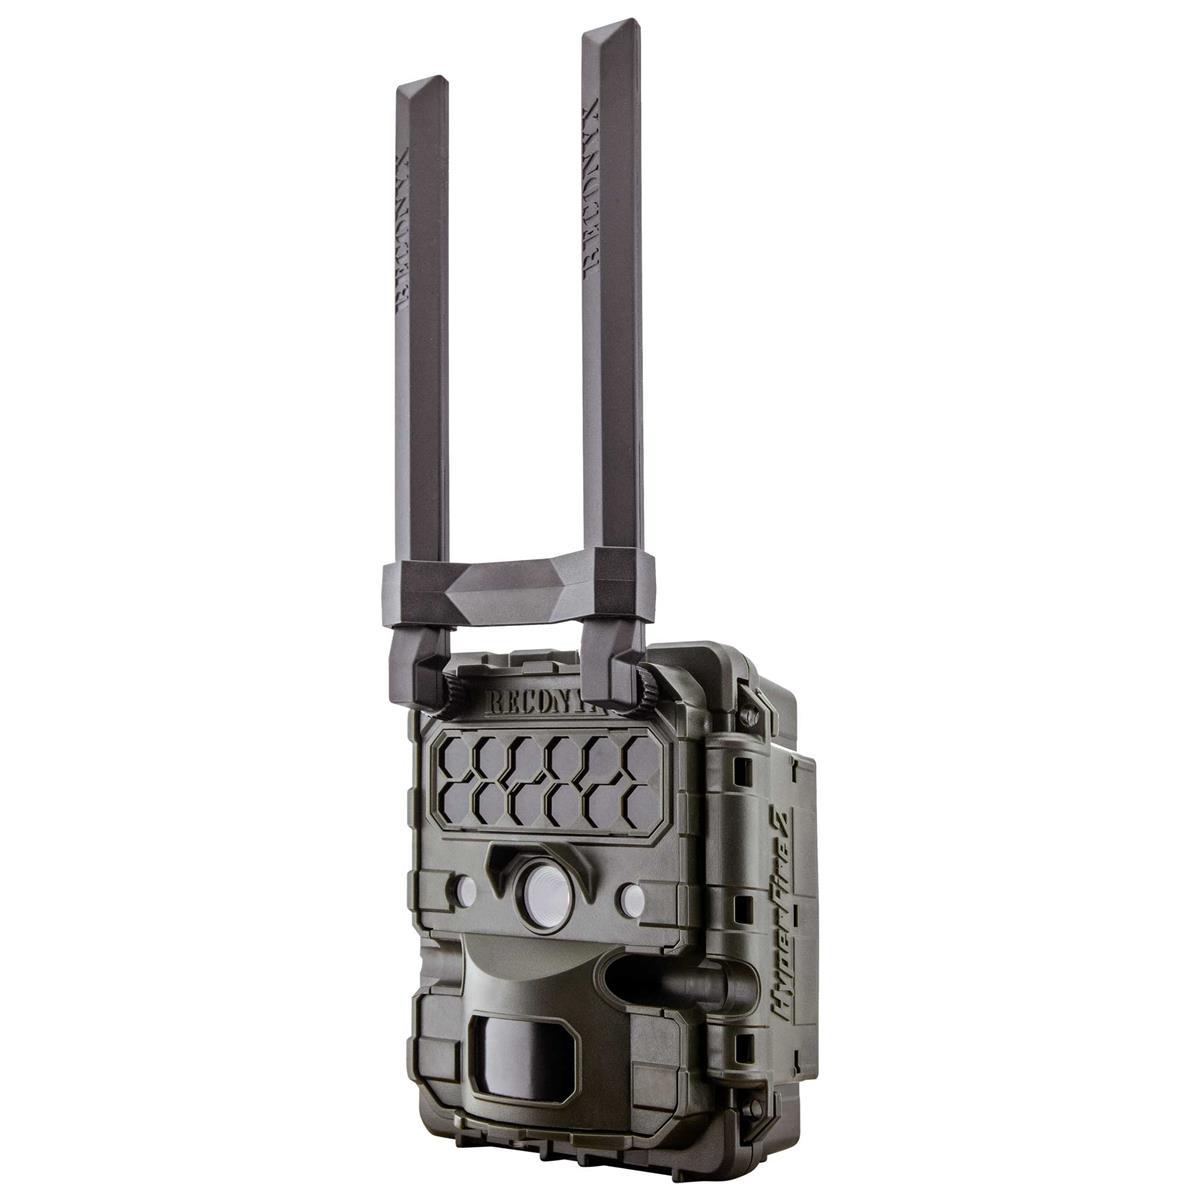 RECONYX HyperFire 2 HF2XC 720p Cellular Trail Day & Night Covert IR Camera, 150' Night Vision, OD Green - Verizon